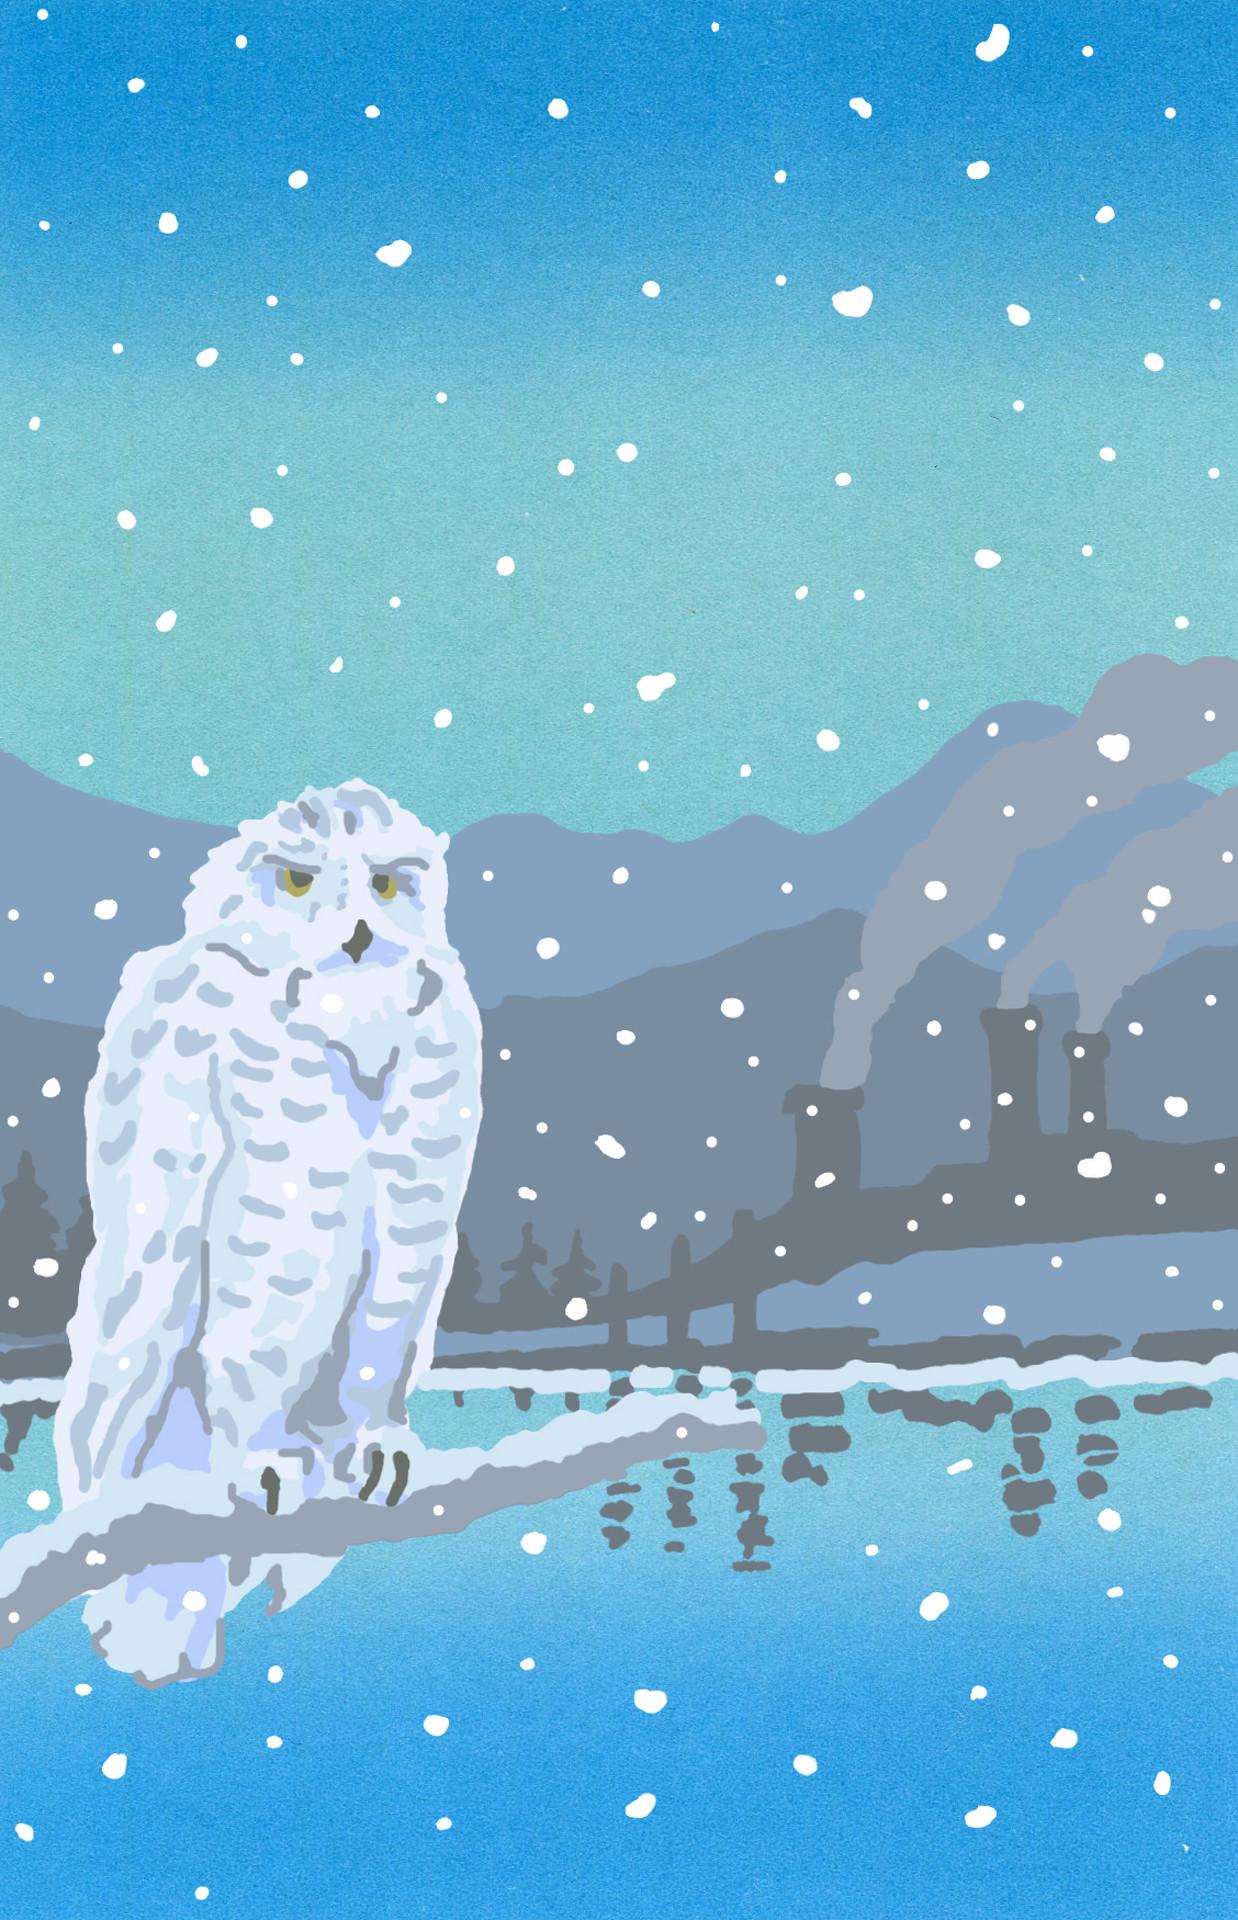 Allan Kollar Christmas card 2015